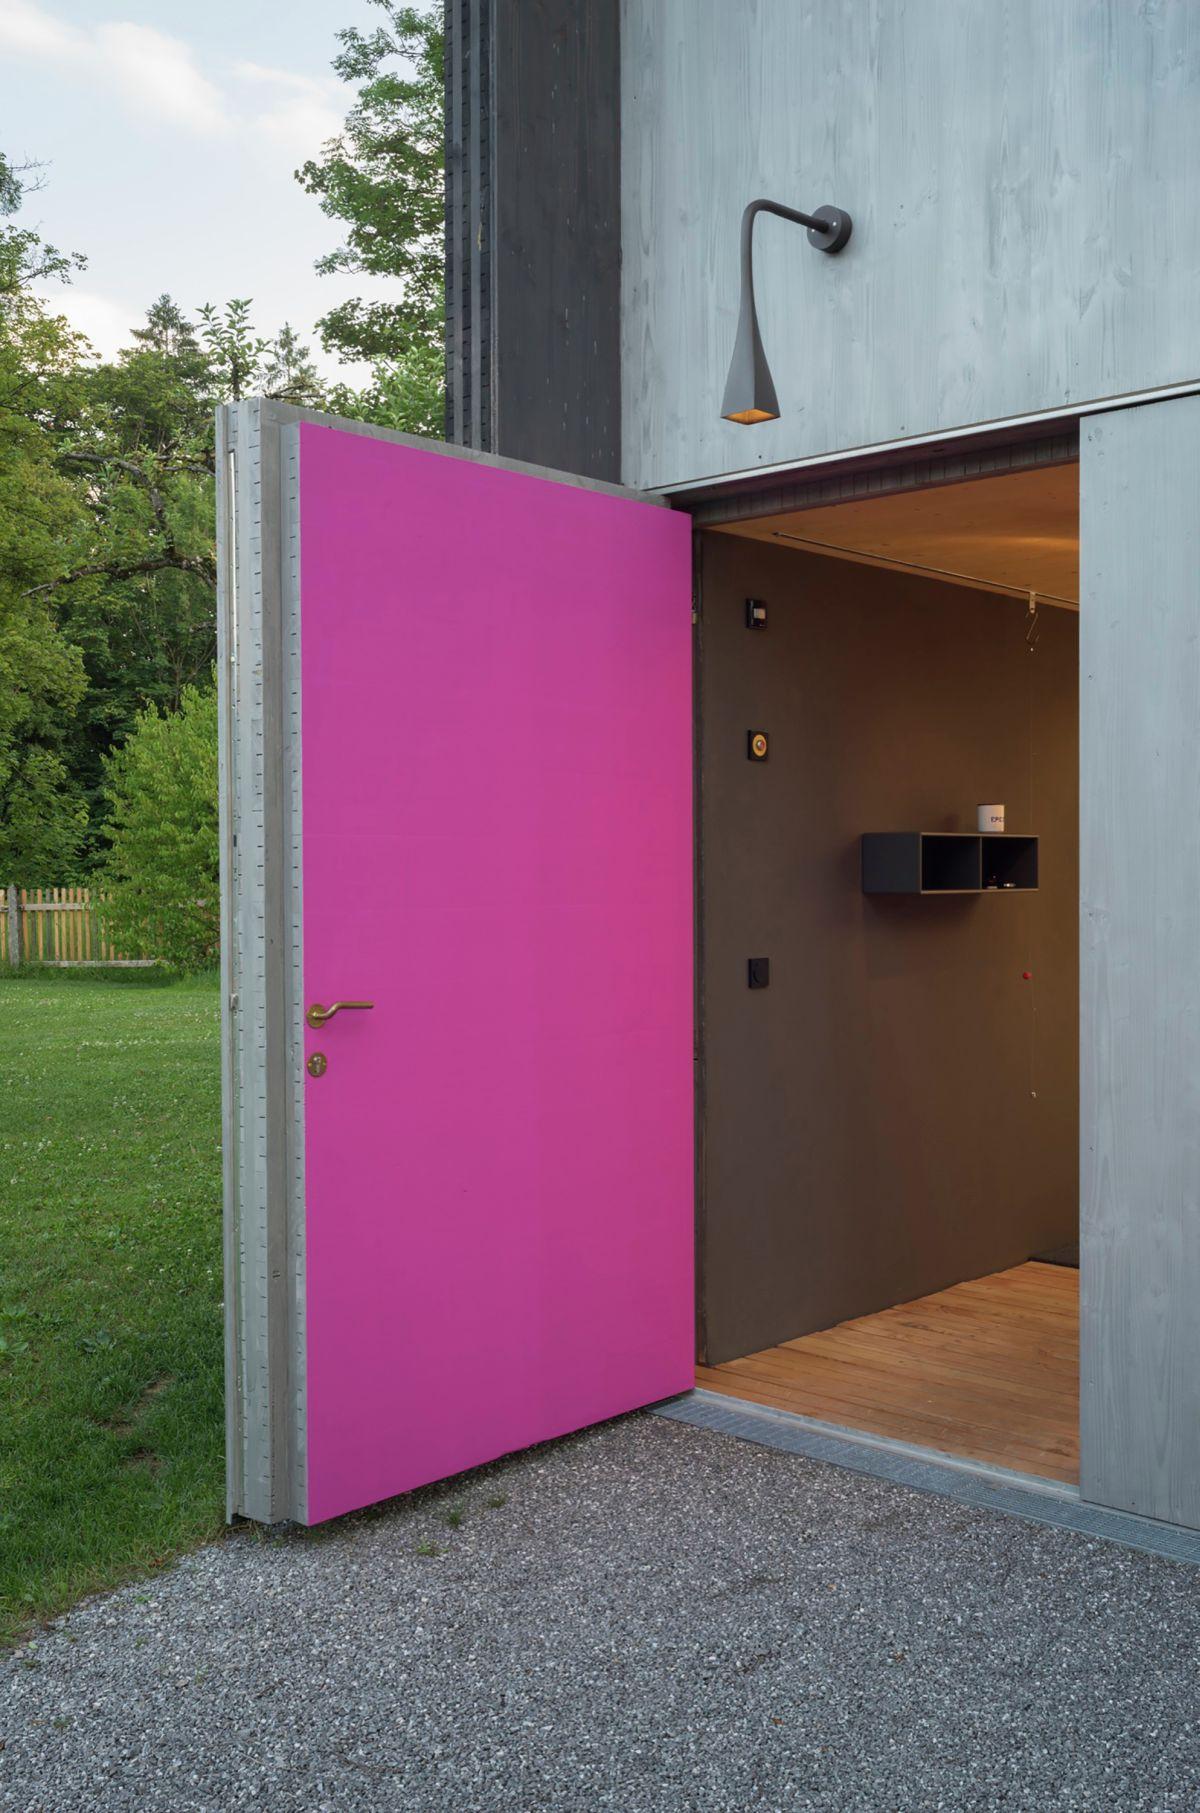 Holzhaus am Auerbach Pink Door Interior